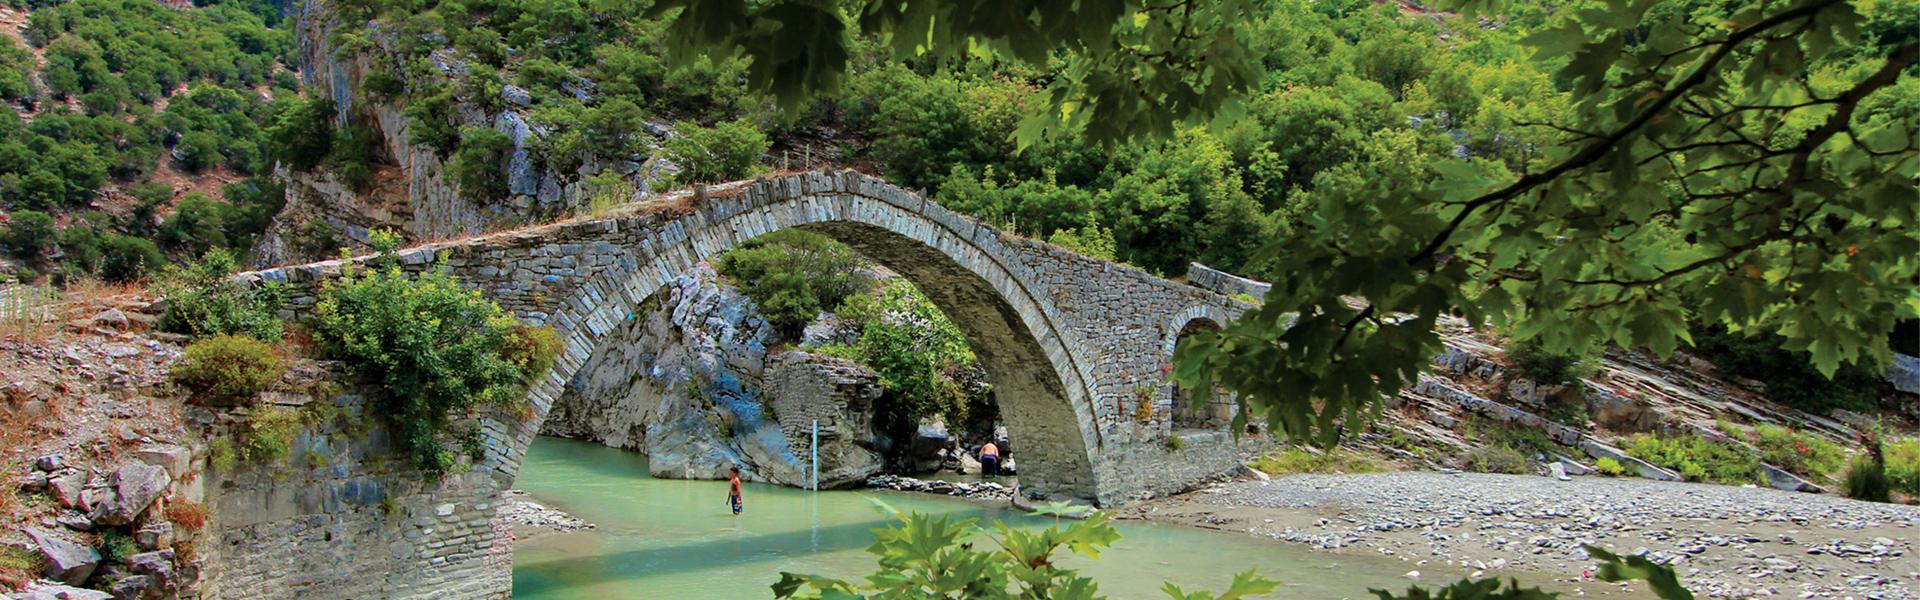 Permet Albanie, Circuit voyages et vacances en albanie